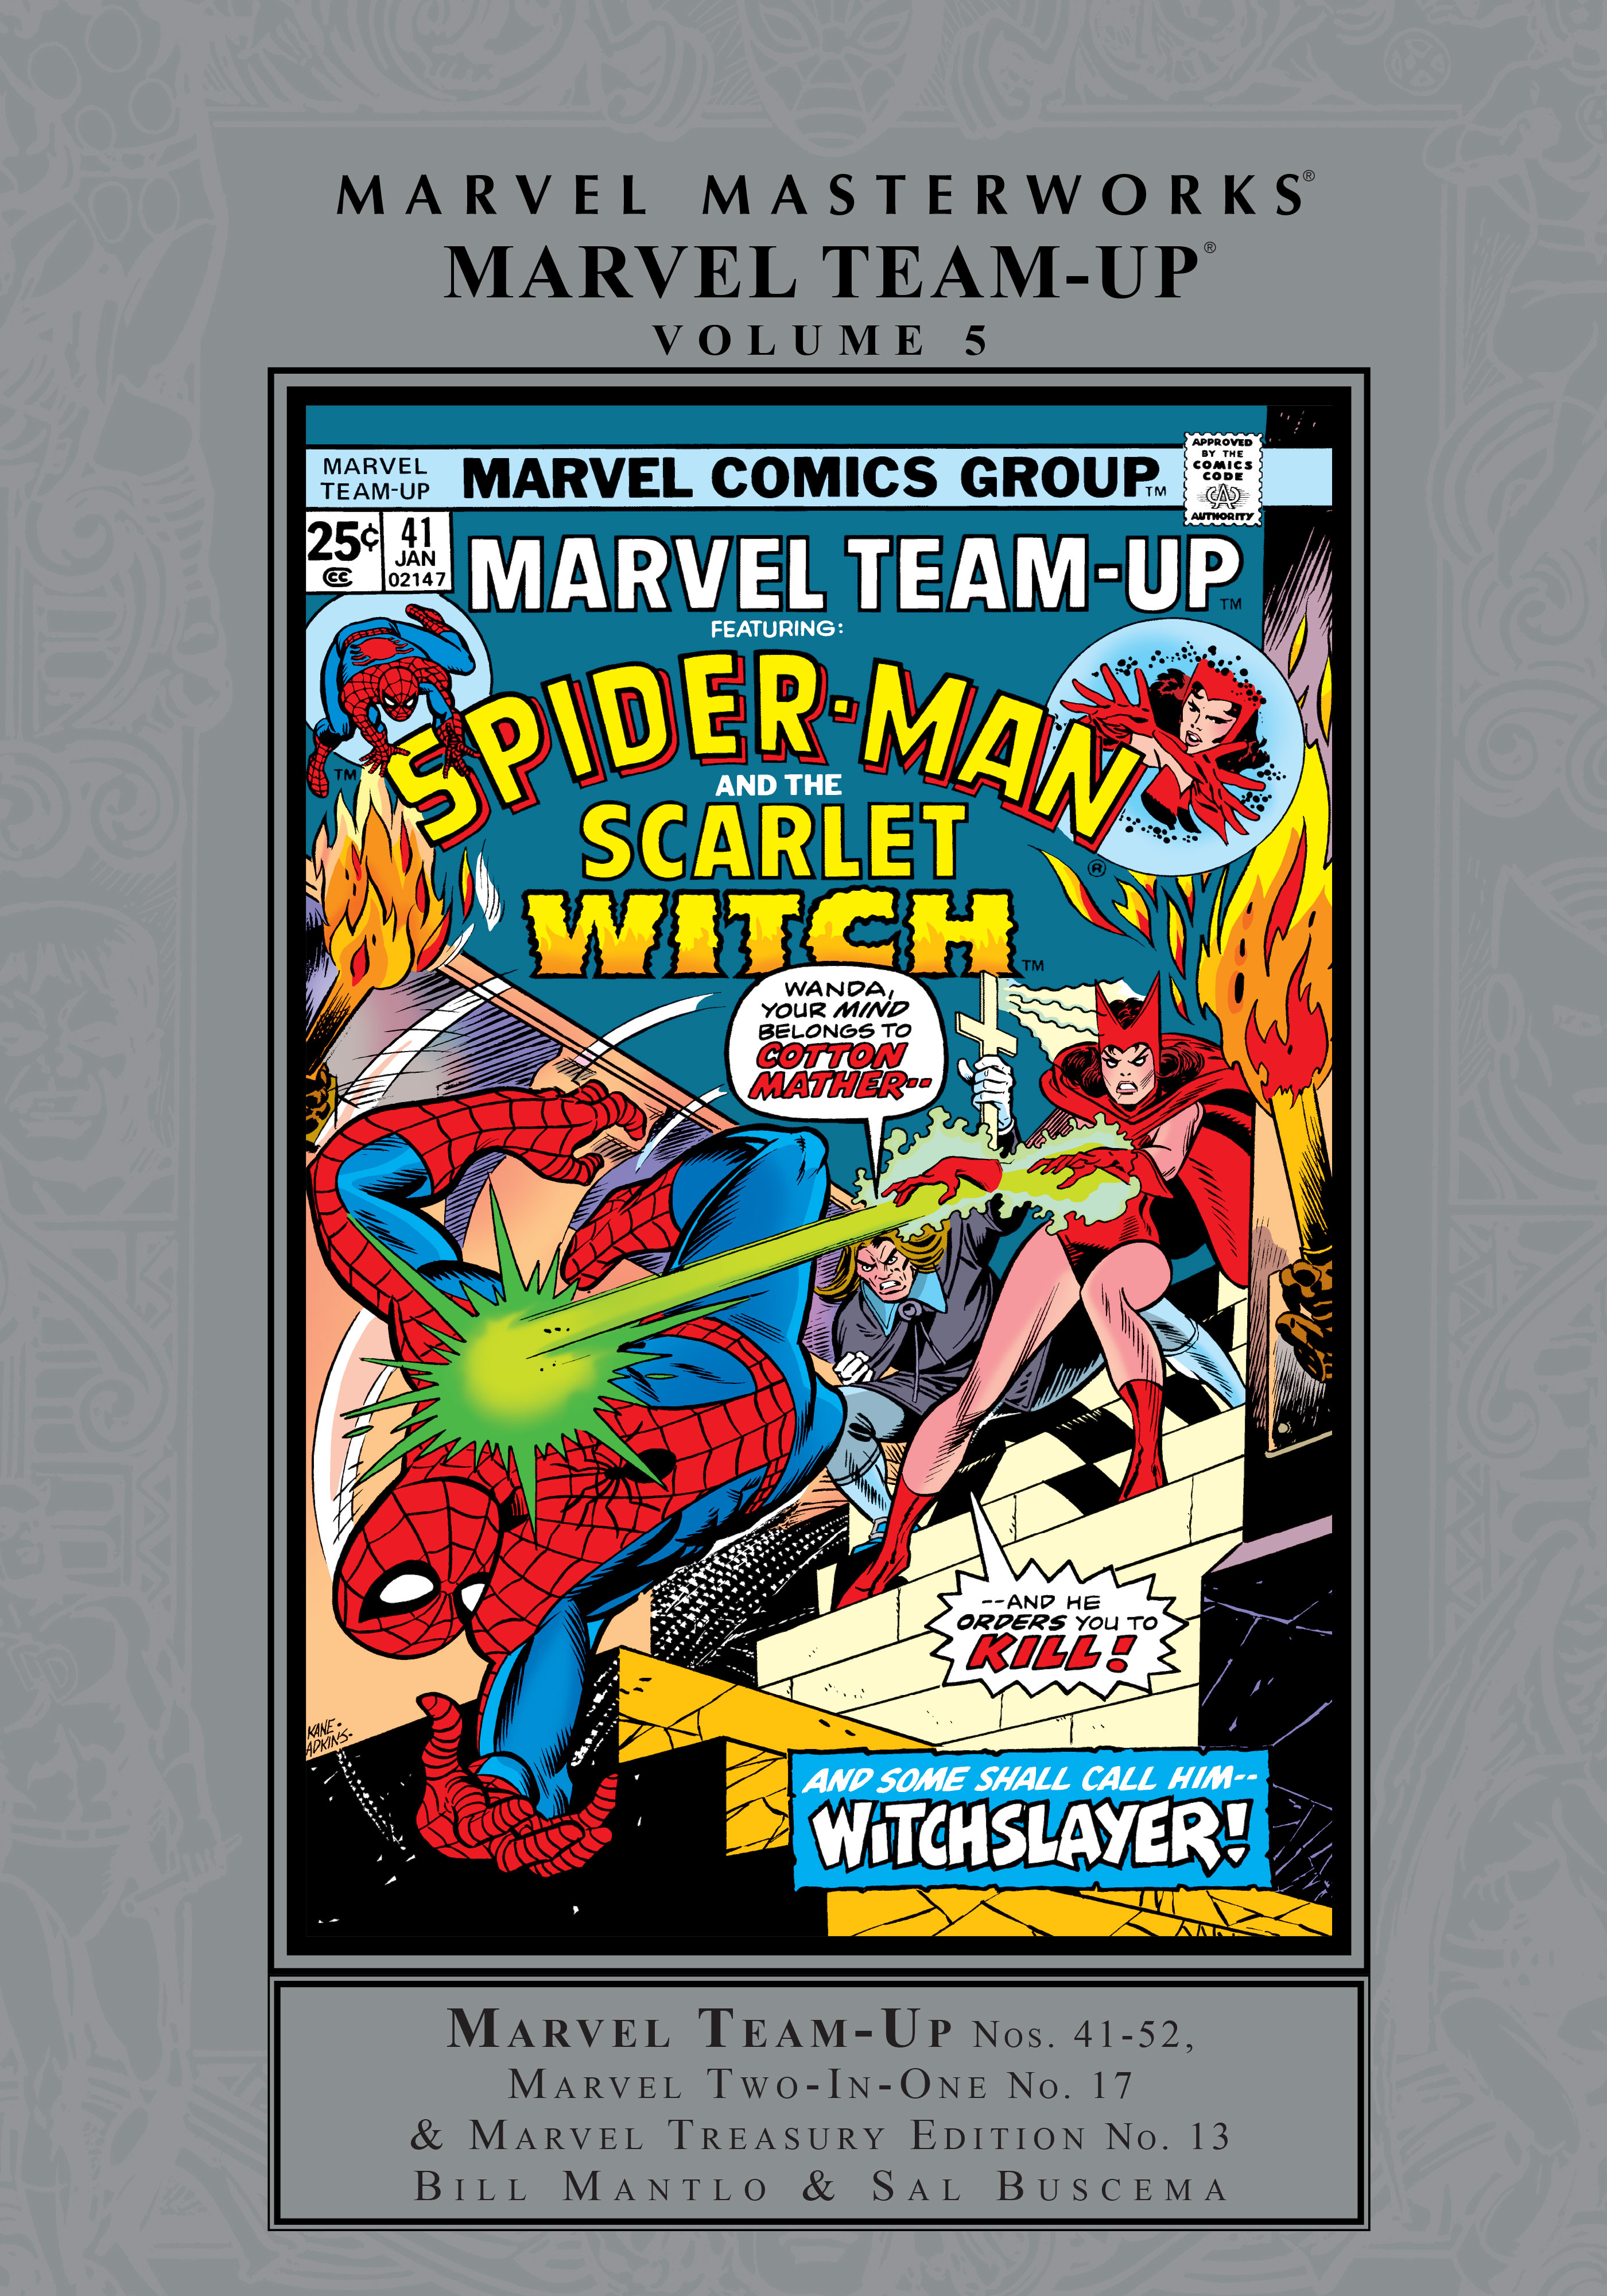 MARVEL MASTERWORKS: MARVEL TEAM-UP VOL. 5 HC (Hardcover)